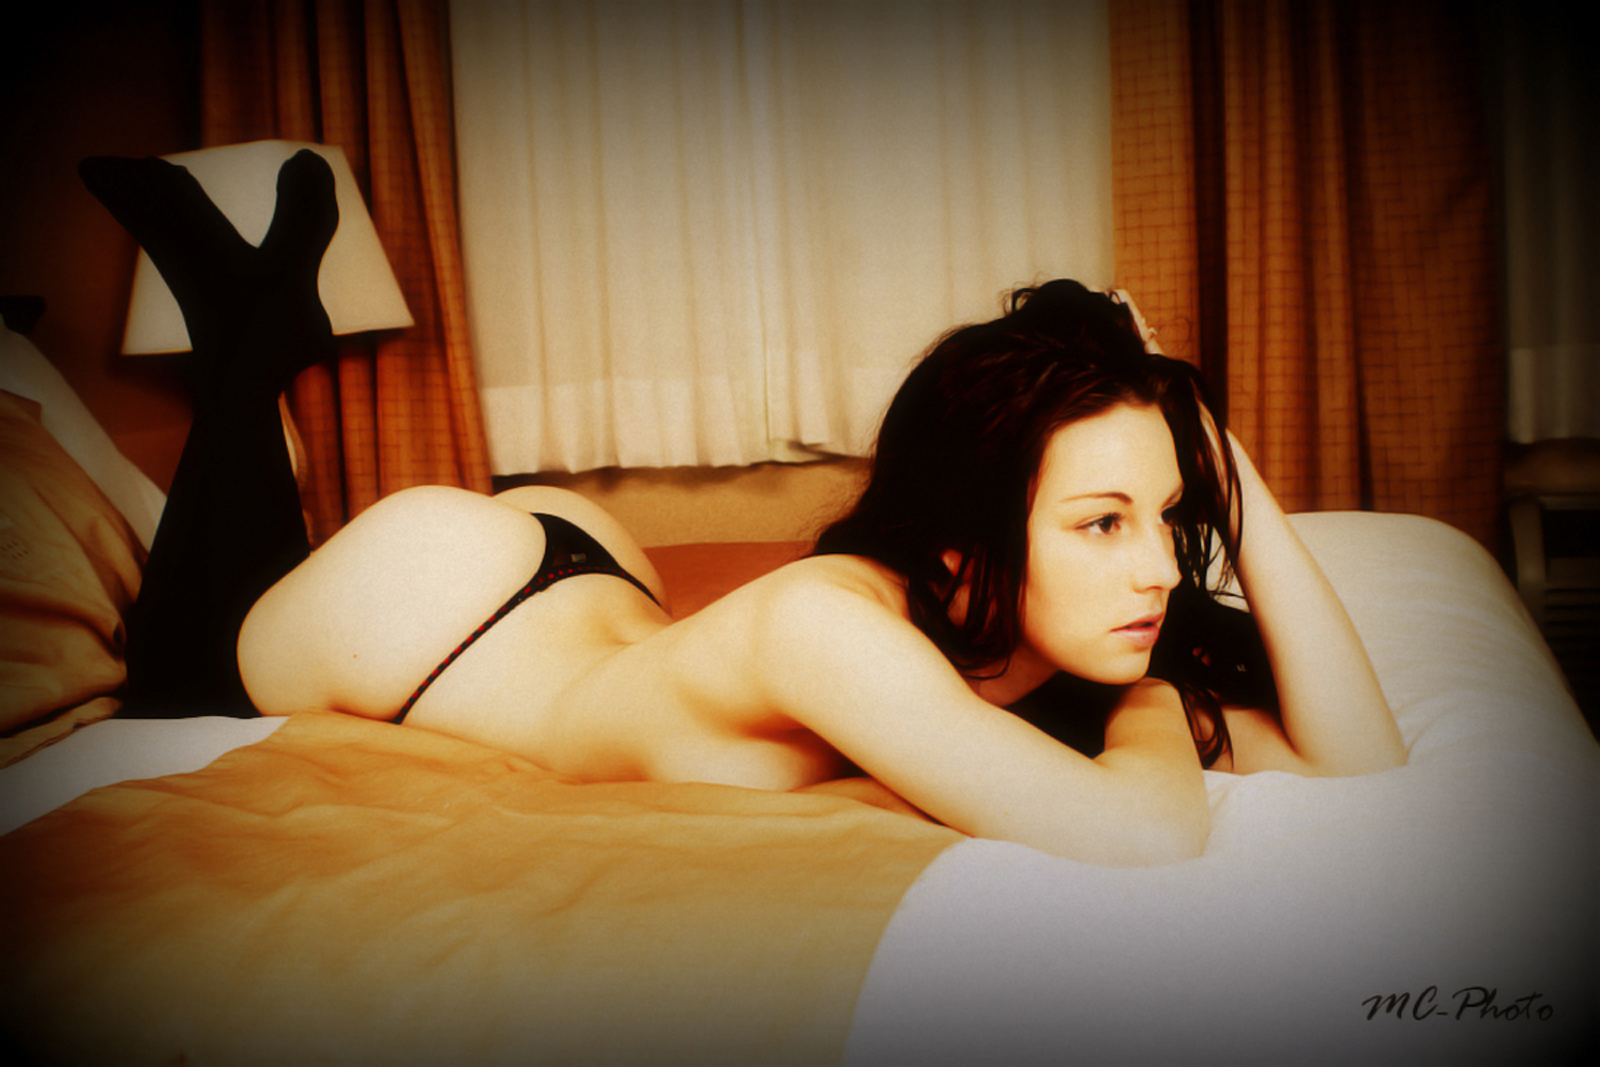 http://1.bp.blogspot.com/_Kpi0thIqeJI/TS92Y0VQDrI/AAAAAAAACQc/Phk-l4cg4bA/s1600/ad907e8e623a1106c178180e09b283d4-d36f46m.jpg